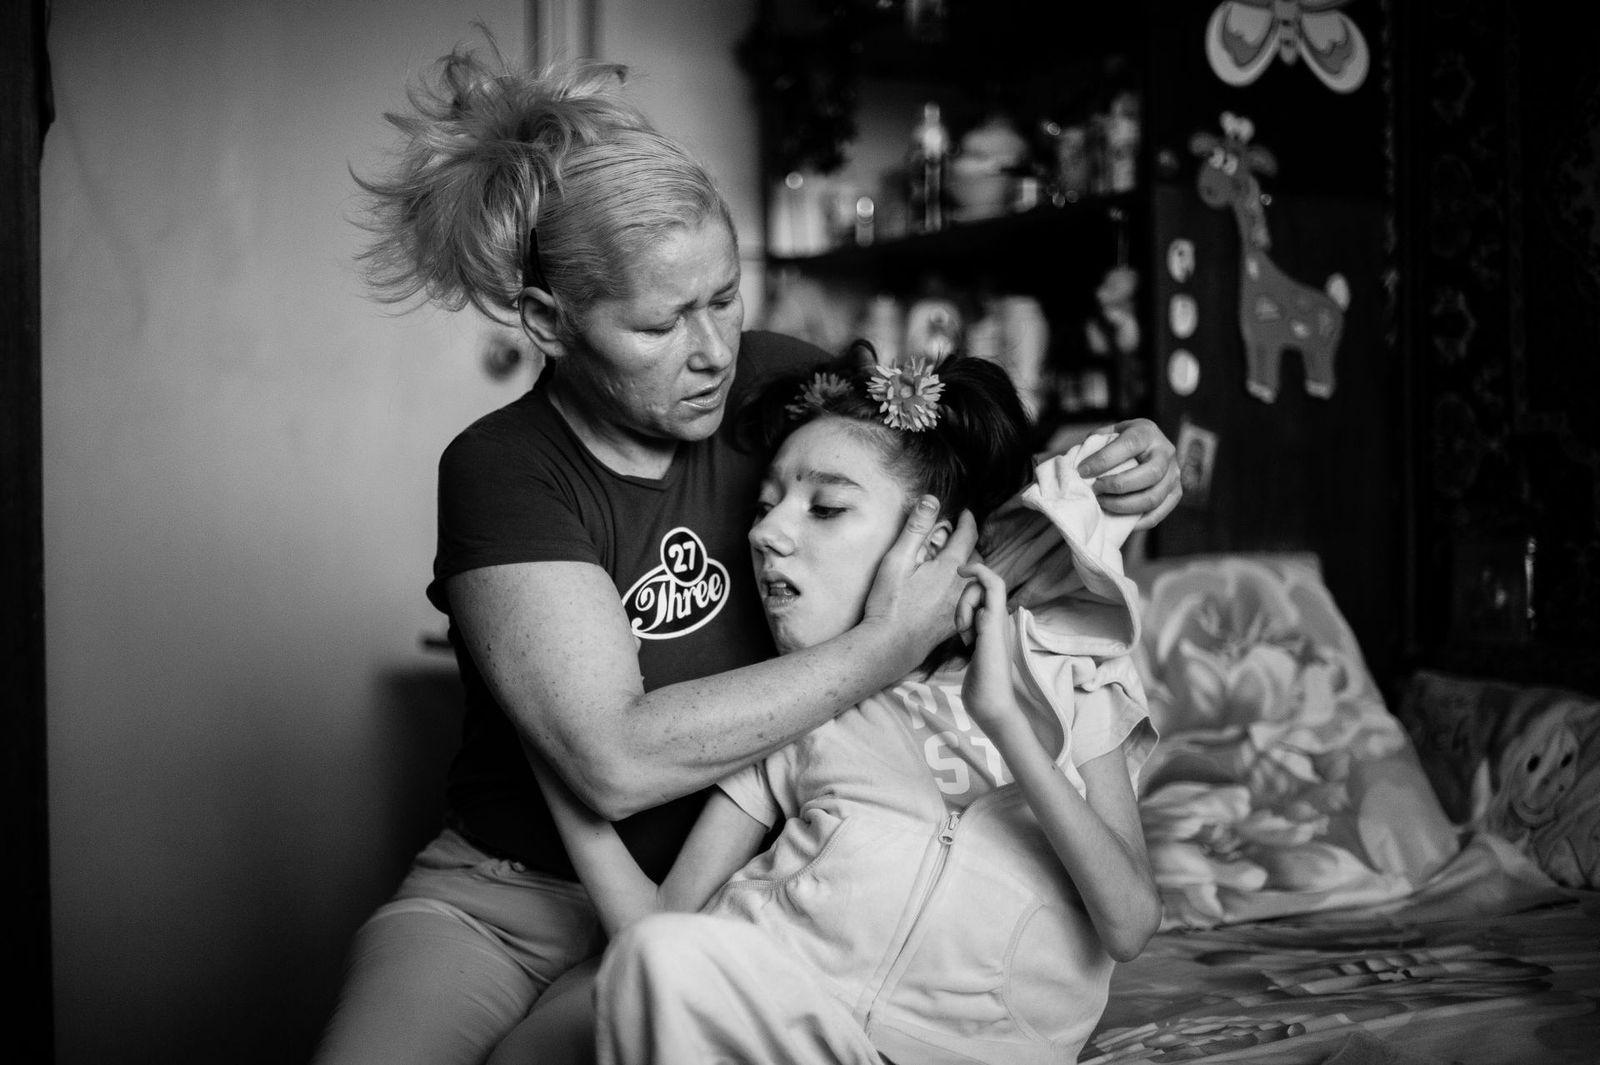 Arik Shraga. Central Ukraine. Masha and her mother